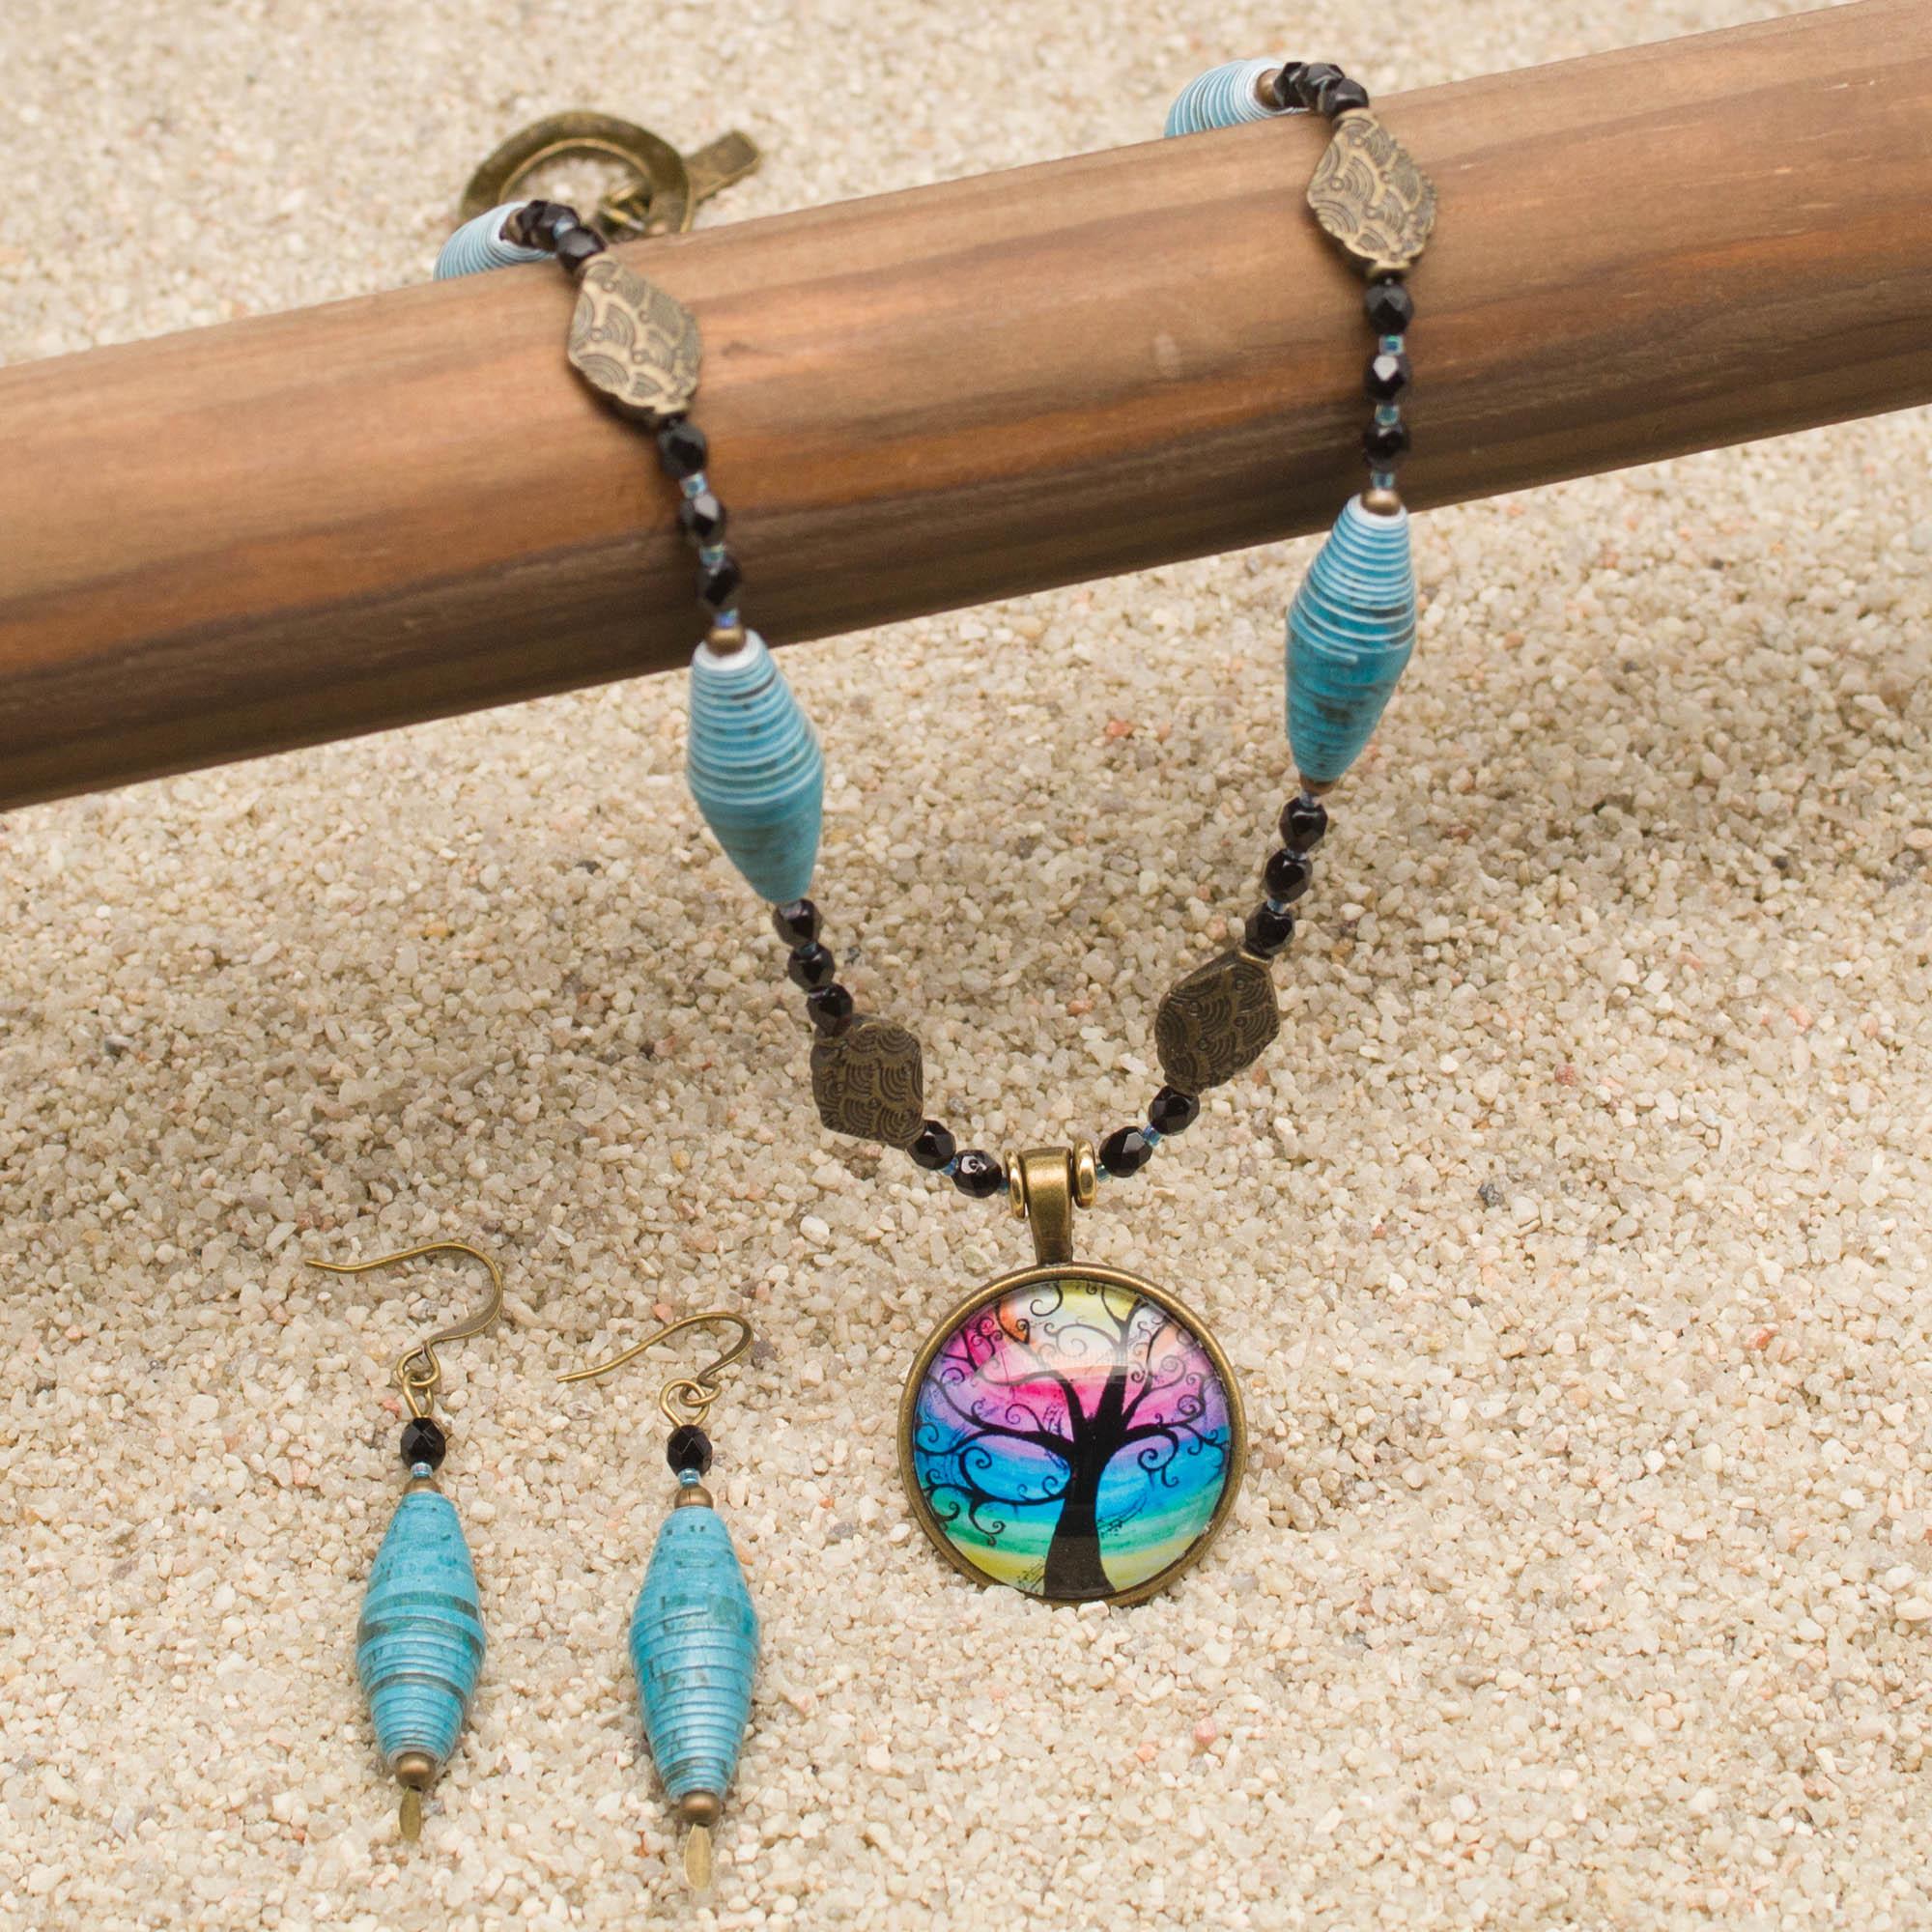 NE812LSb - Mystic Blues Necklace and Earring Set